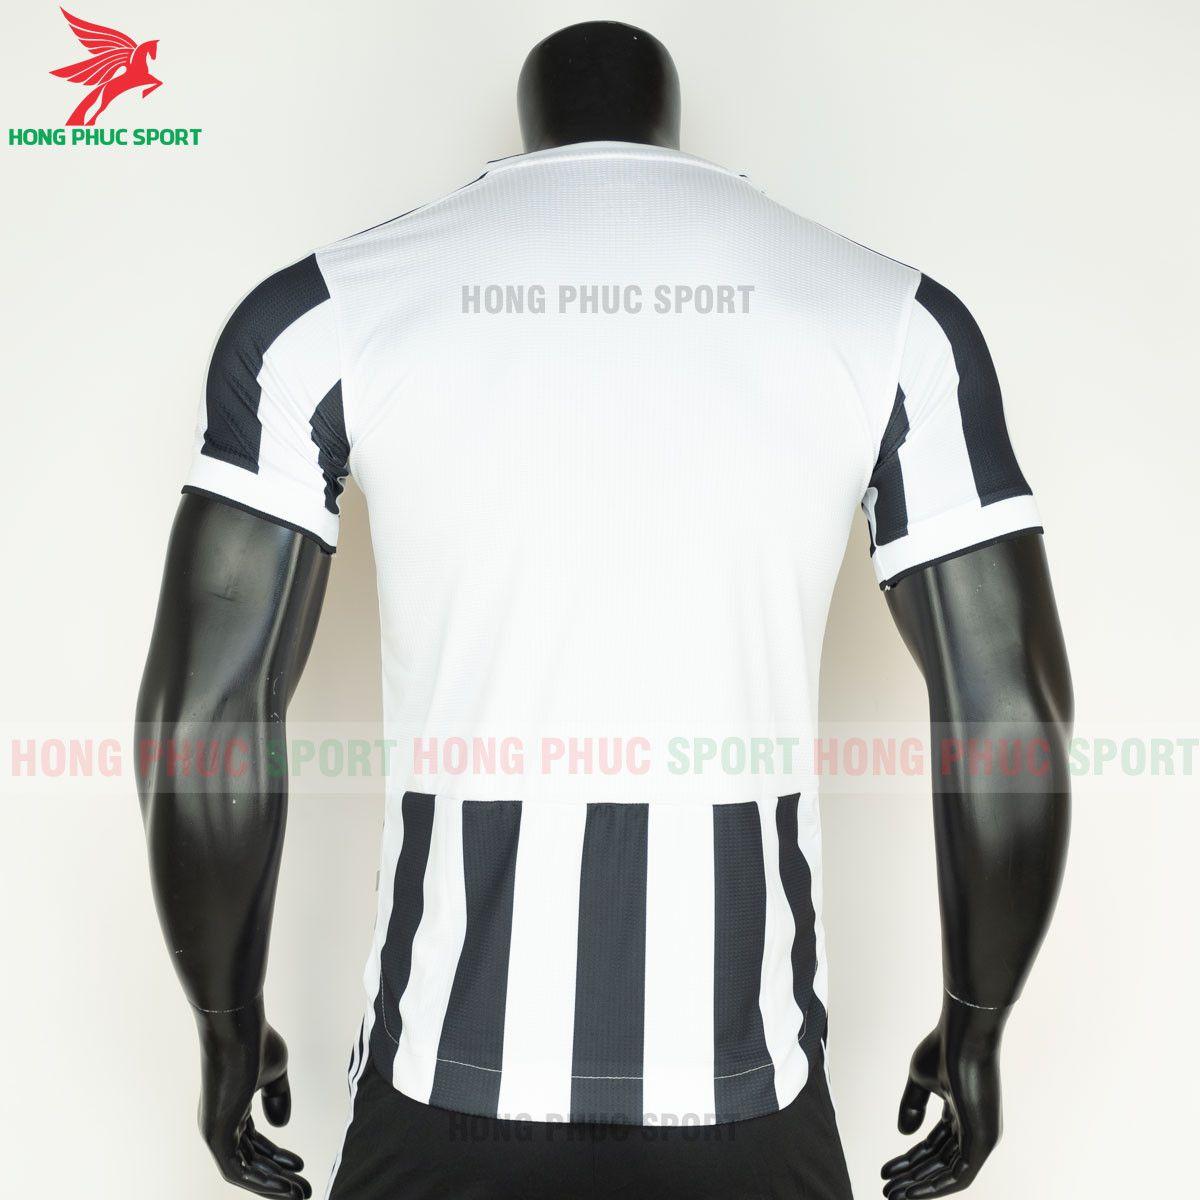 https://cdn.hongphucsport.com/unsafe/s4.shopbay.vn/files/285/ao-bong-da-juventus-2021-2022-san-nha-hang-thai-7-60d309612fc19.jpg